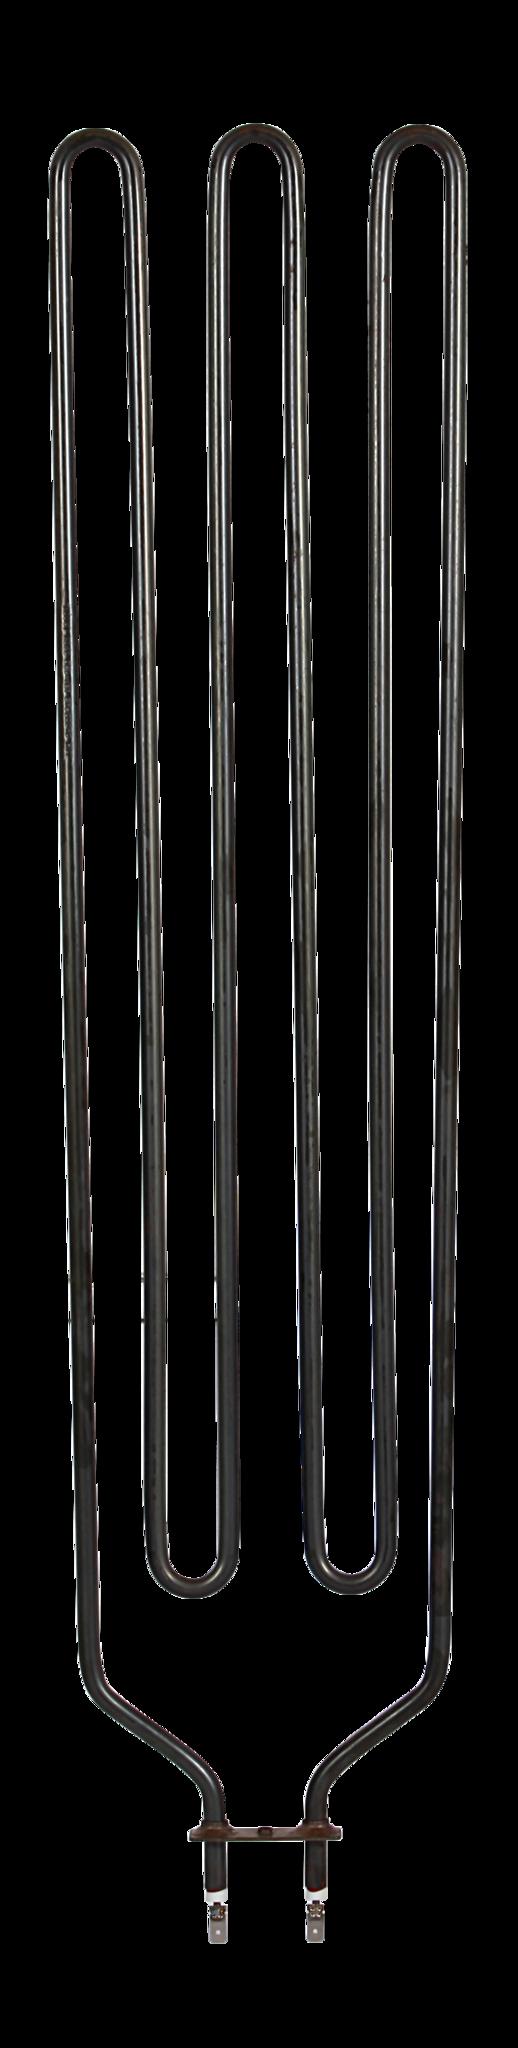 ТЭН-ы: ТЭН SAWO HP70-006 для электрических печей Aries (1,5 кВт)